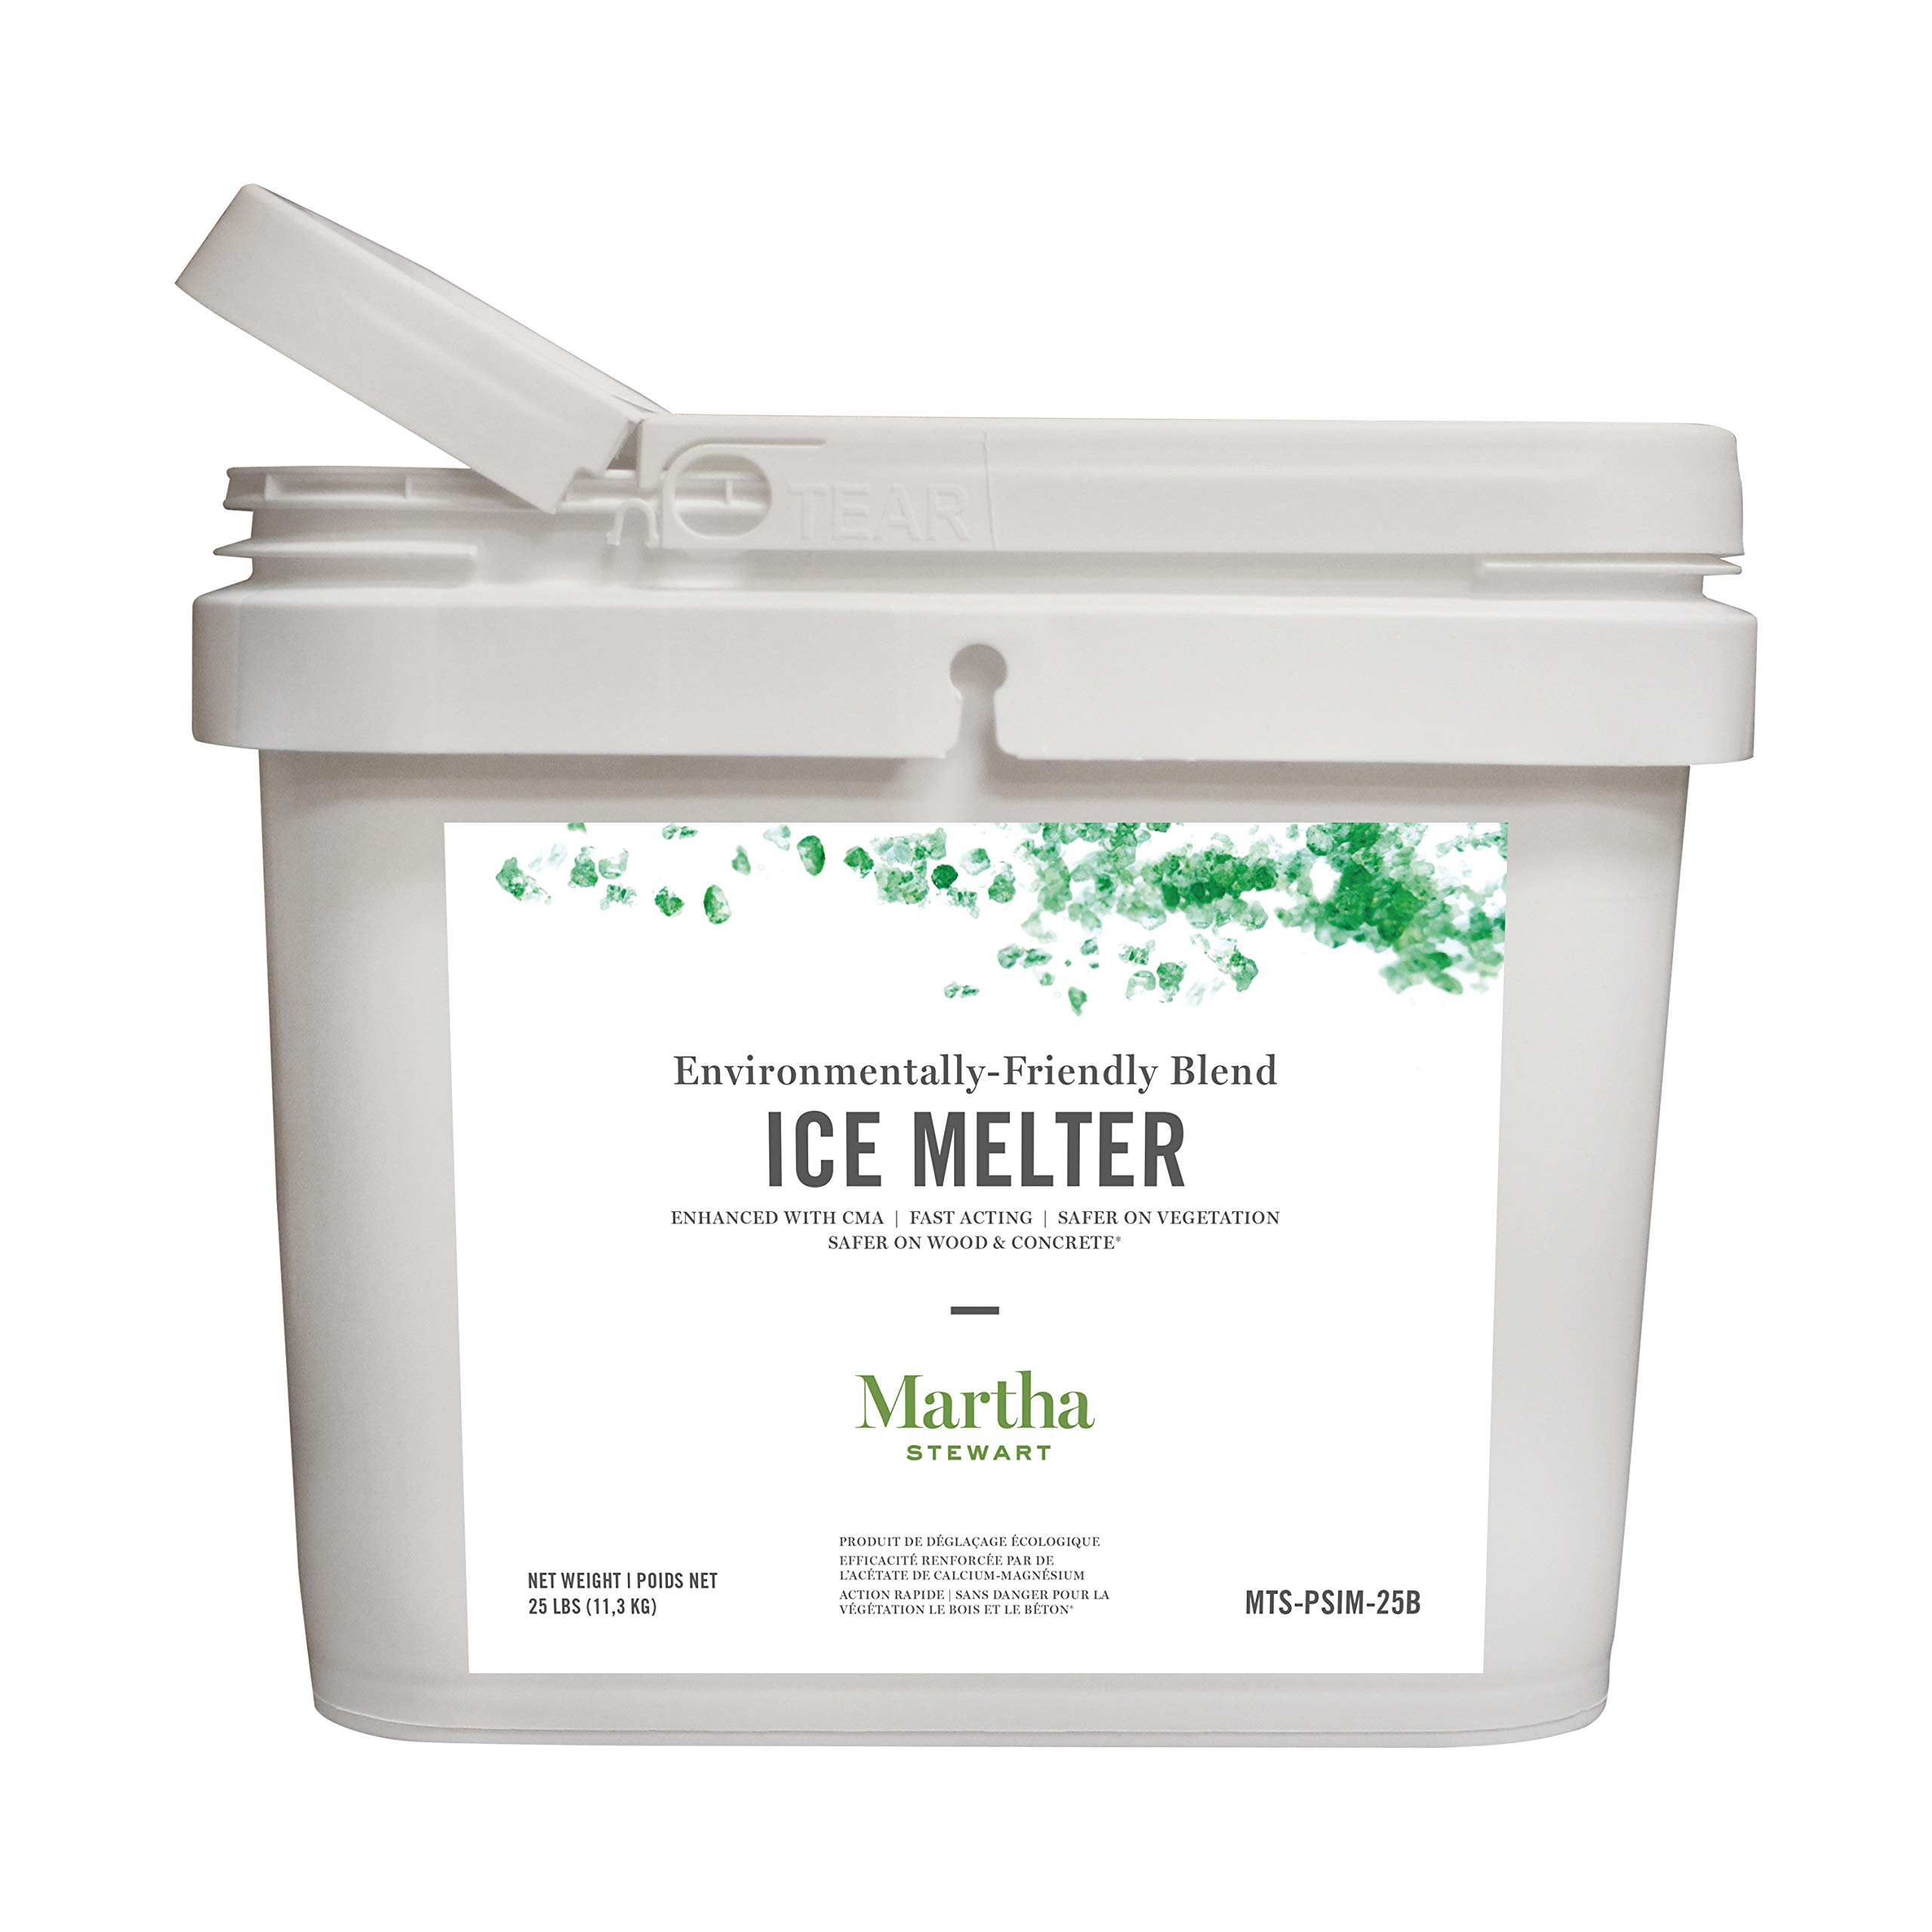 Martha Stewart 25LB Blended Ice Melter | Resealable Bucket/Scoop | Environmentally Friendly | Pet Safe by Snow Joe